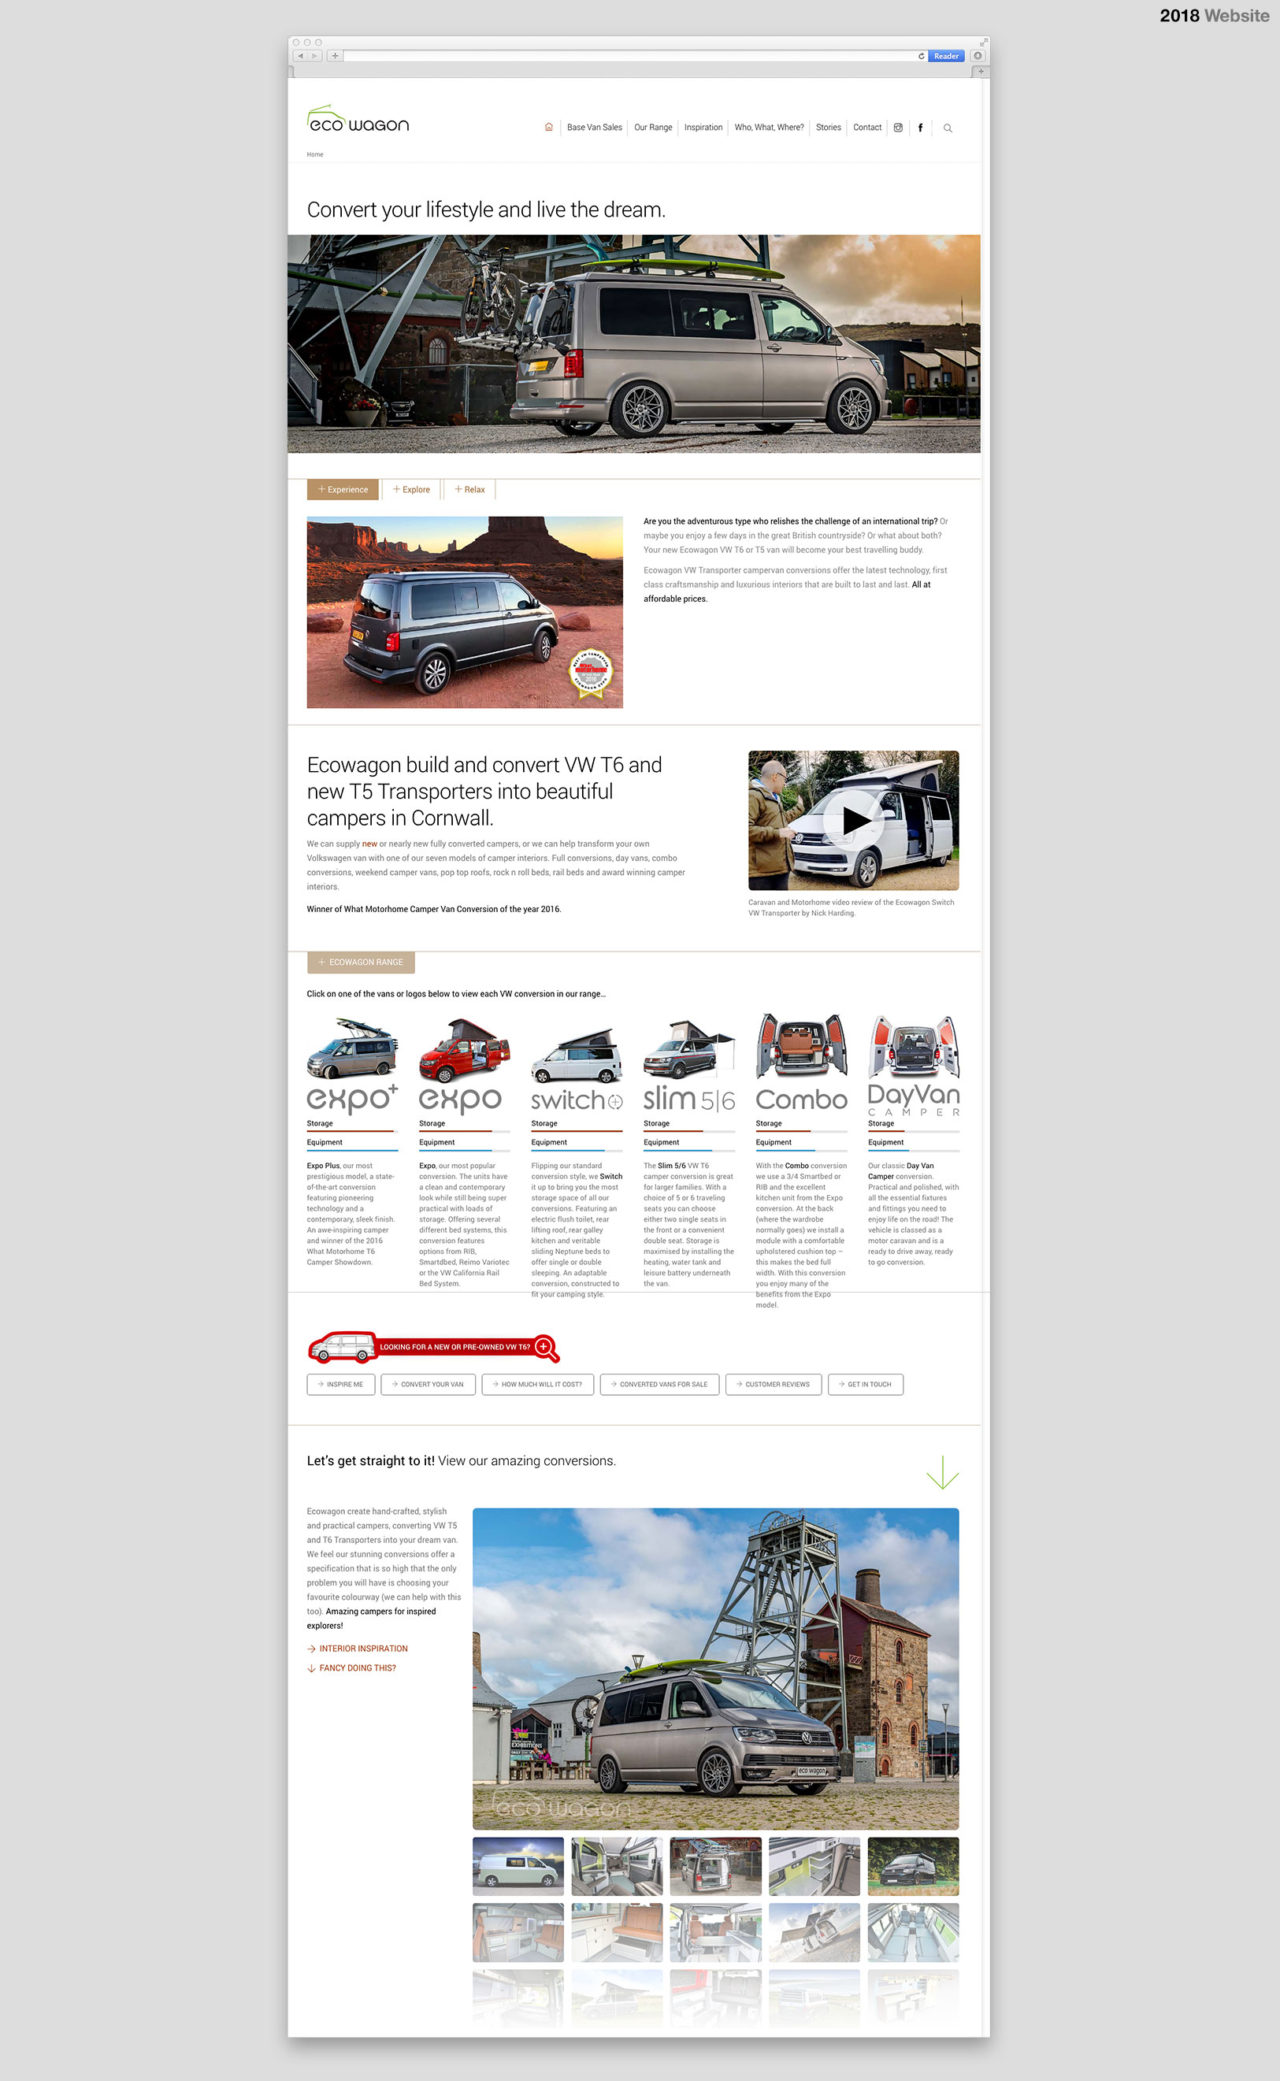 Ecowagon VW Conversions Website